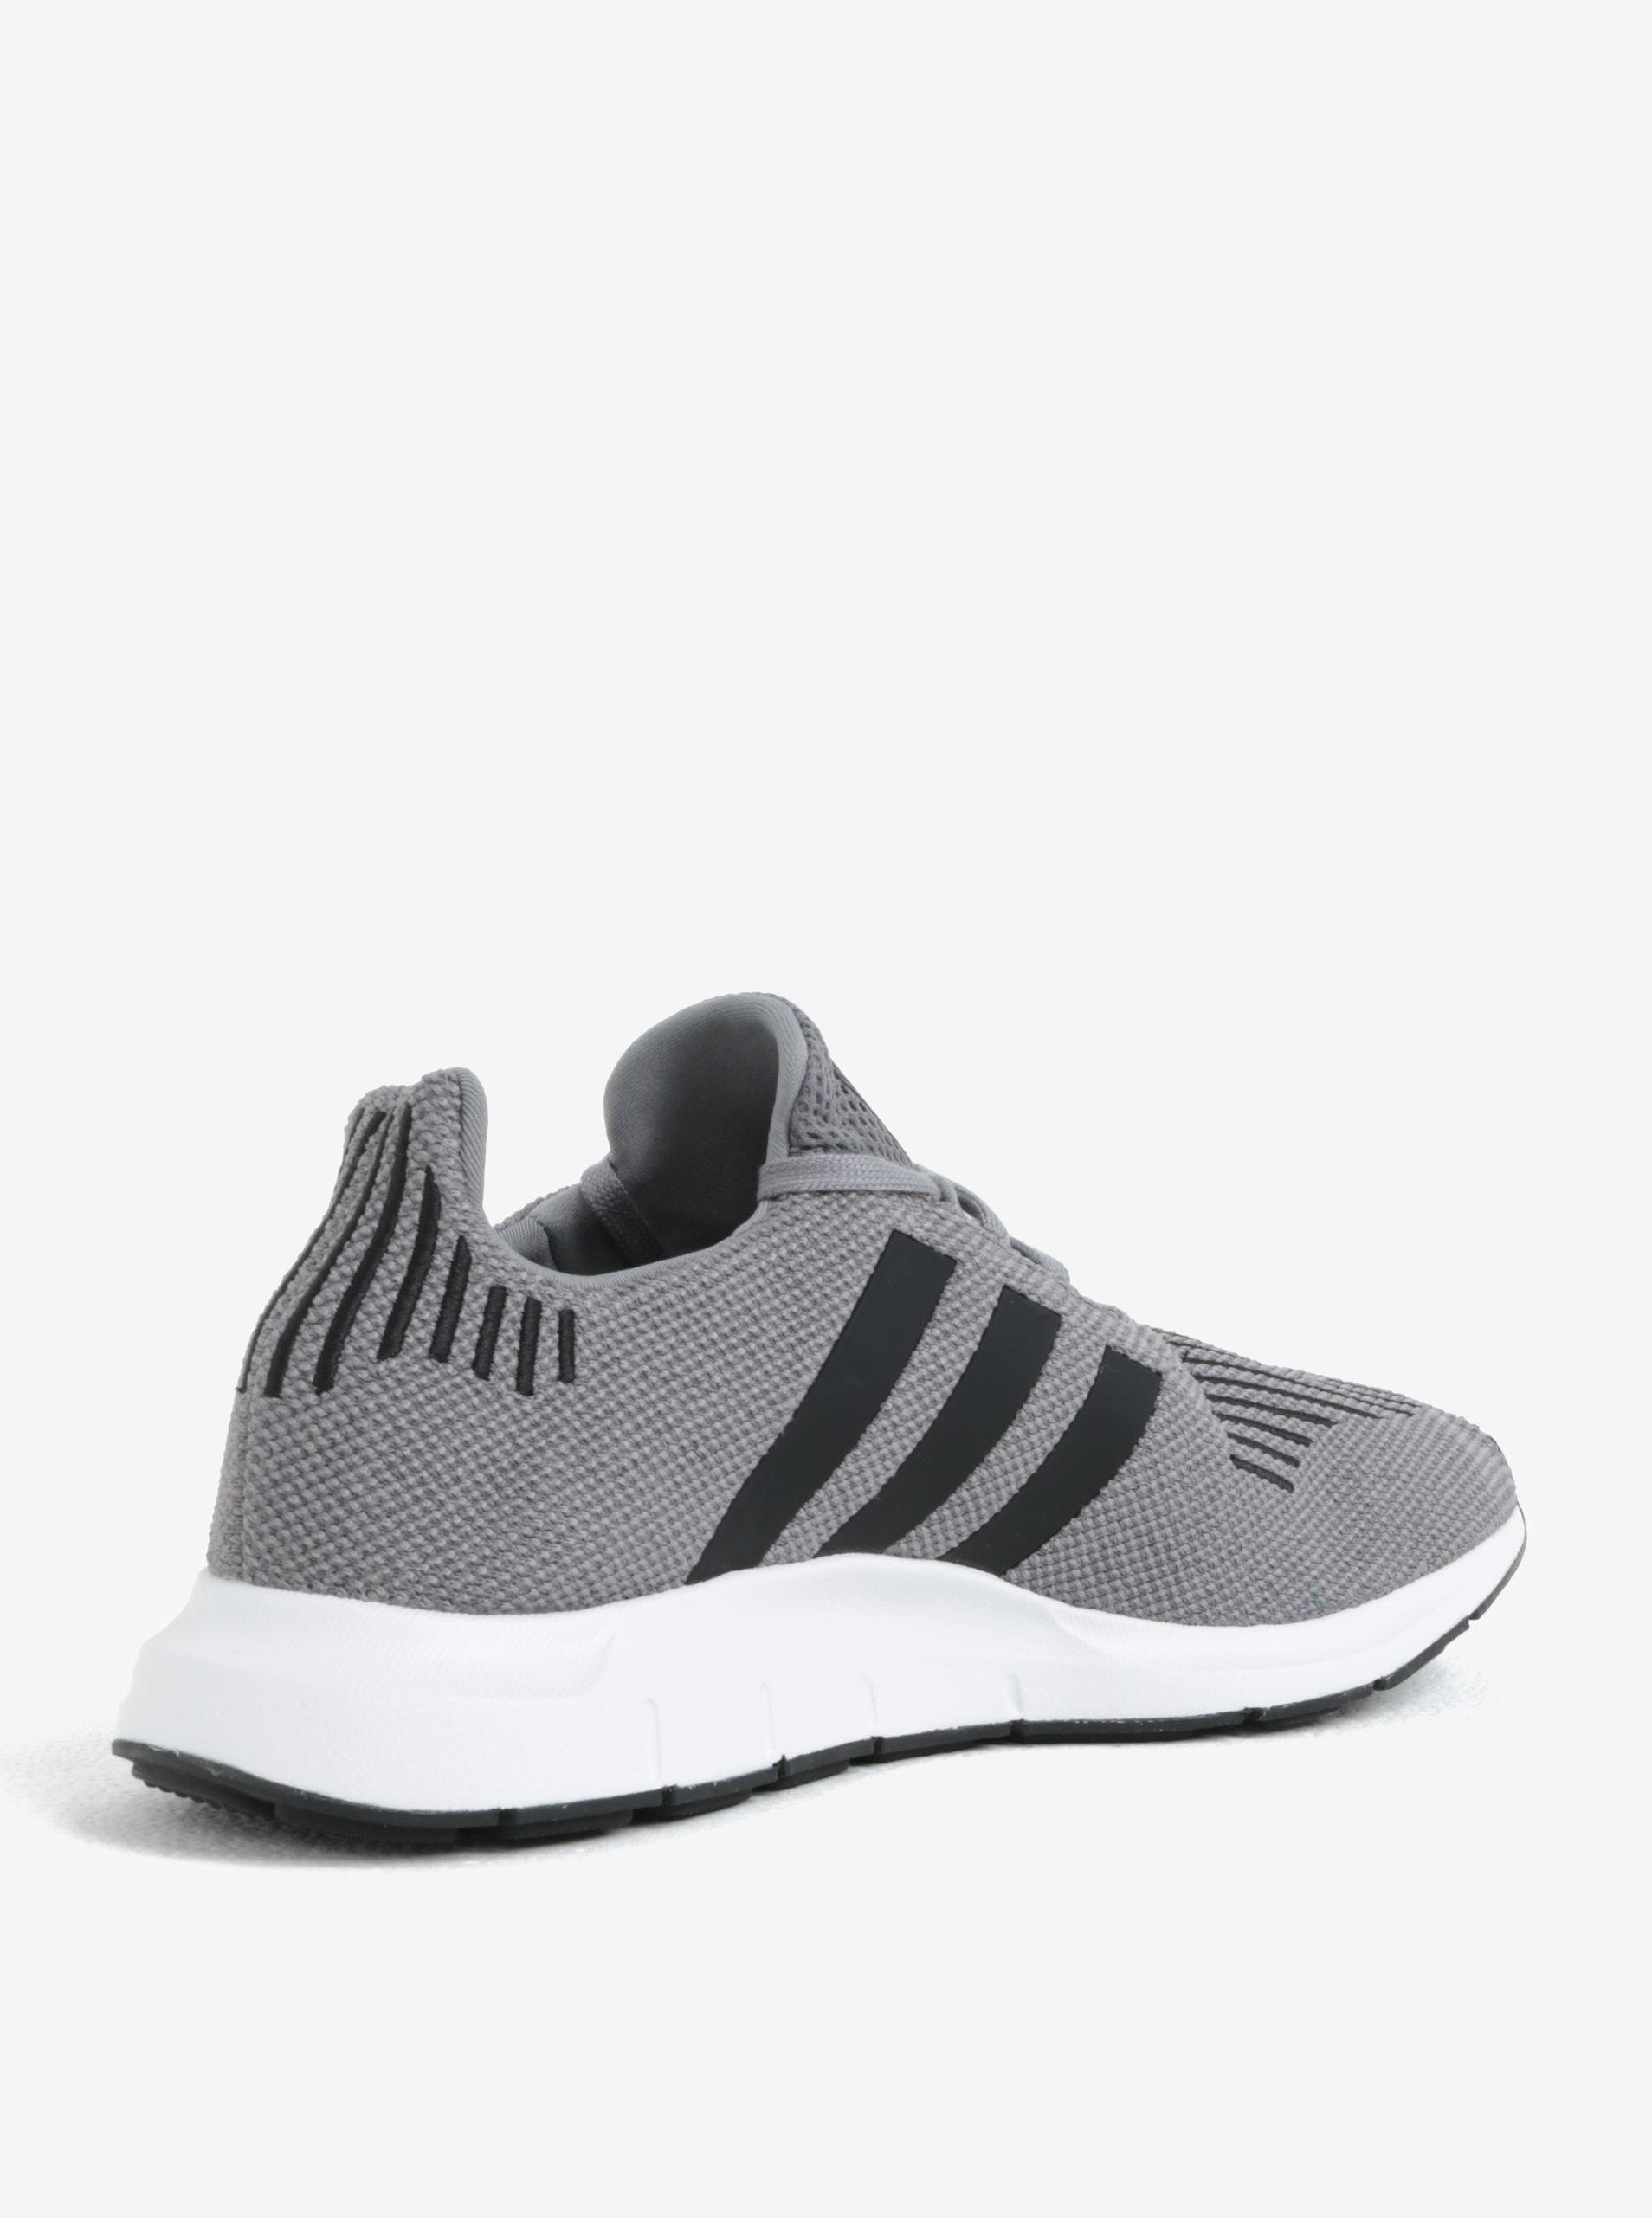 Sivé pánske tenisky adidas Originals Swift run ... 213b64bf5a3